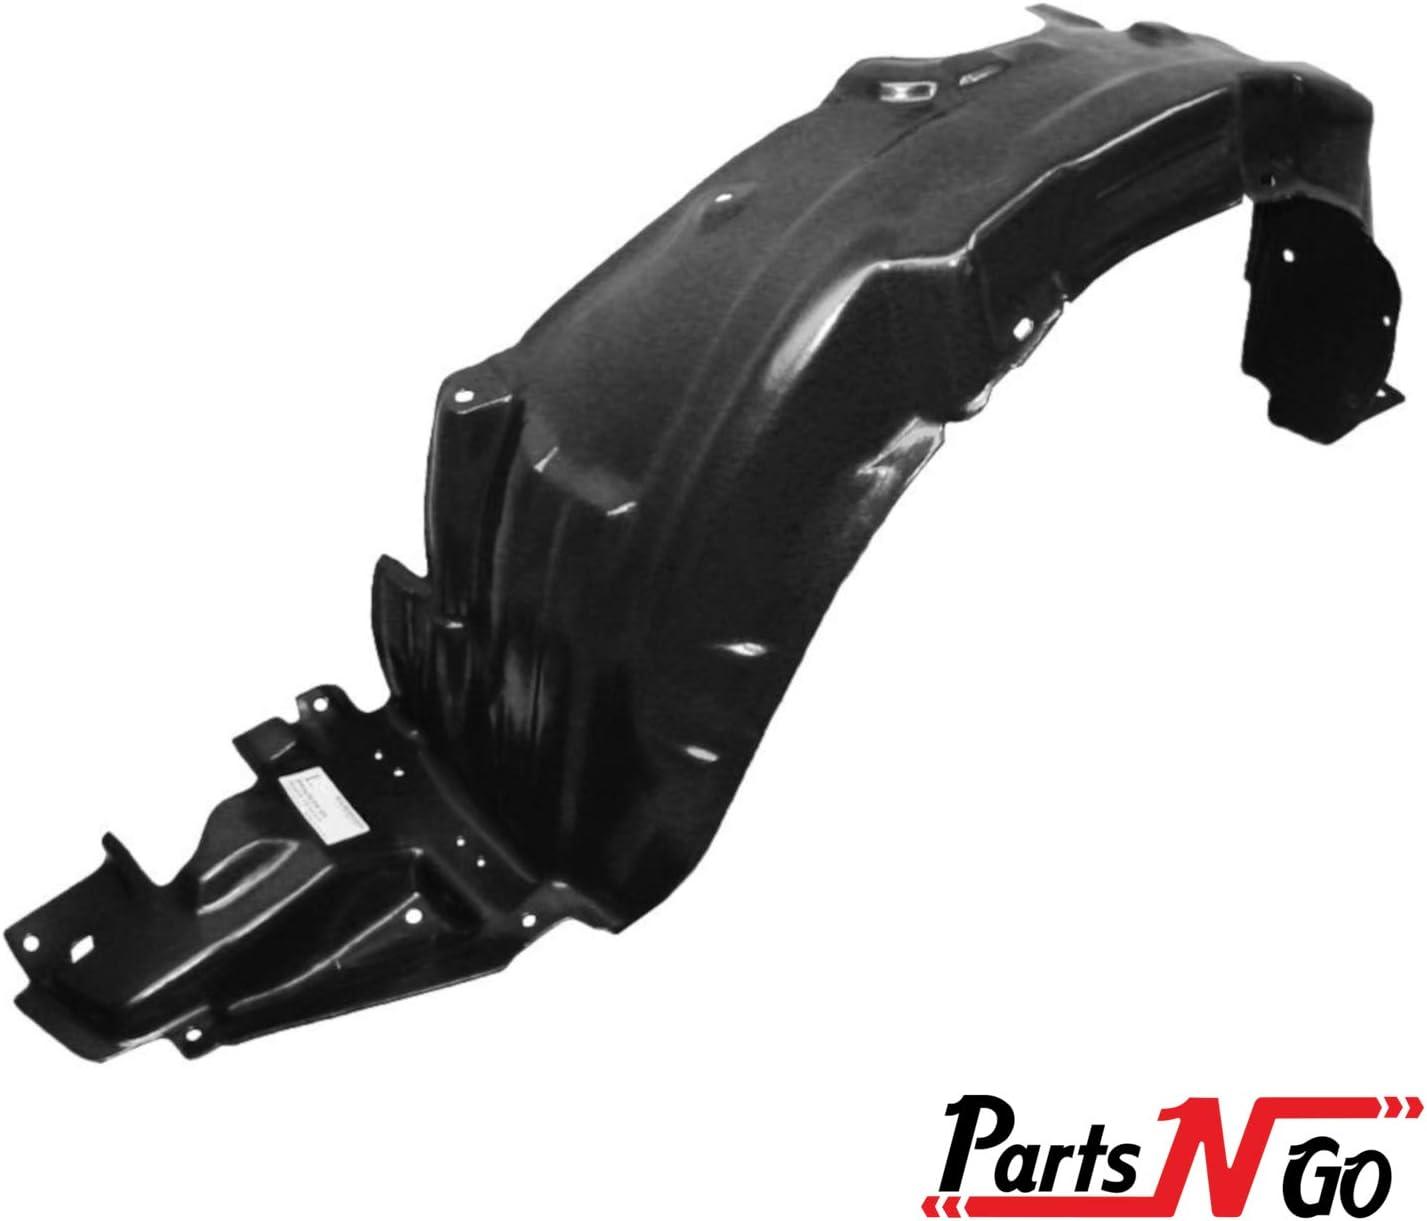 04-09 Prius NEW Left Front Inner Fender Liner Driver side TO1250116